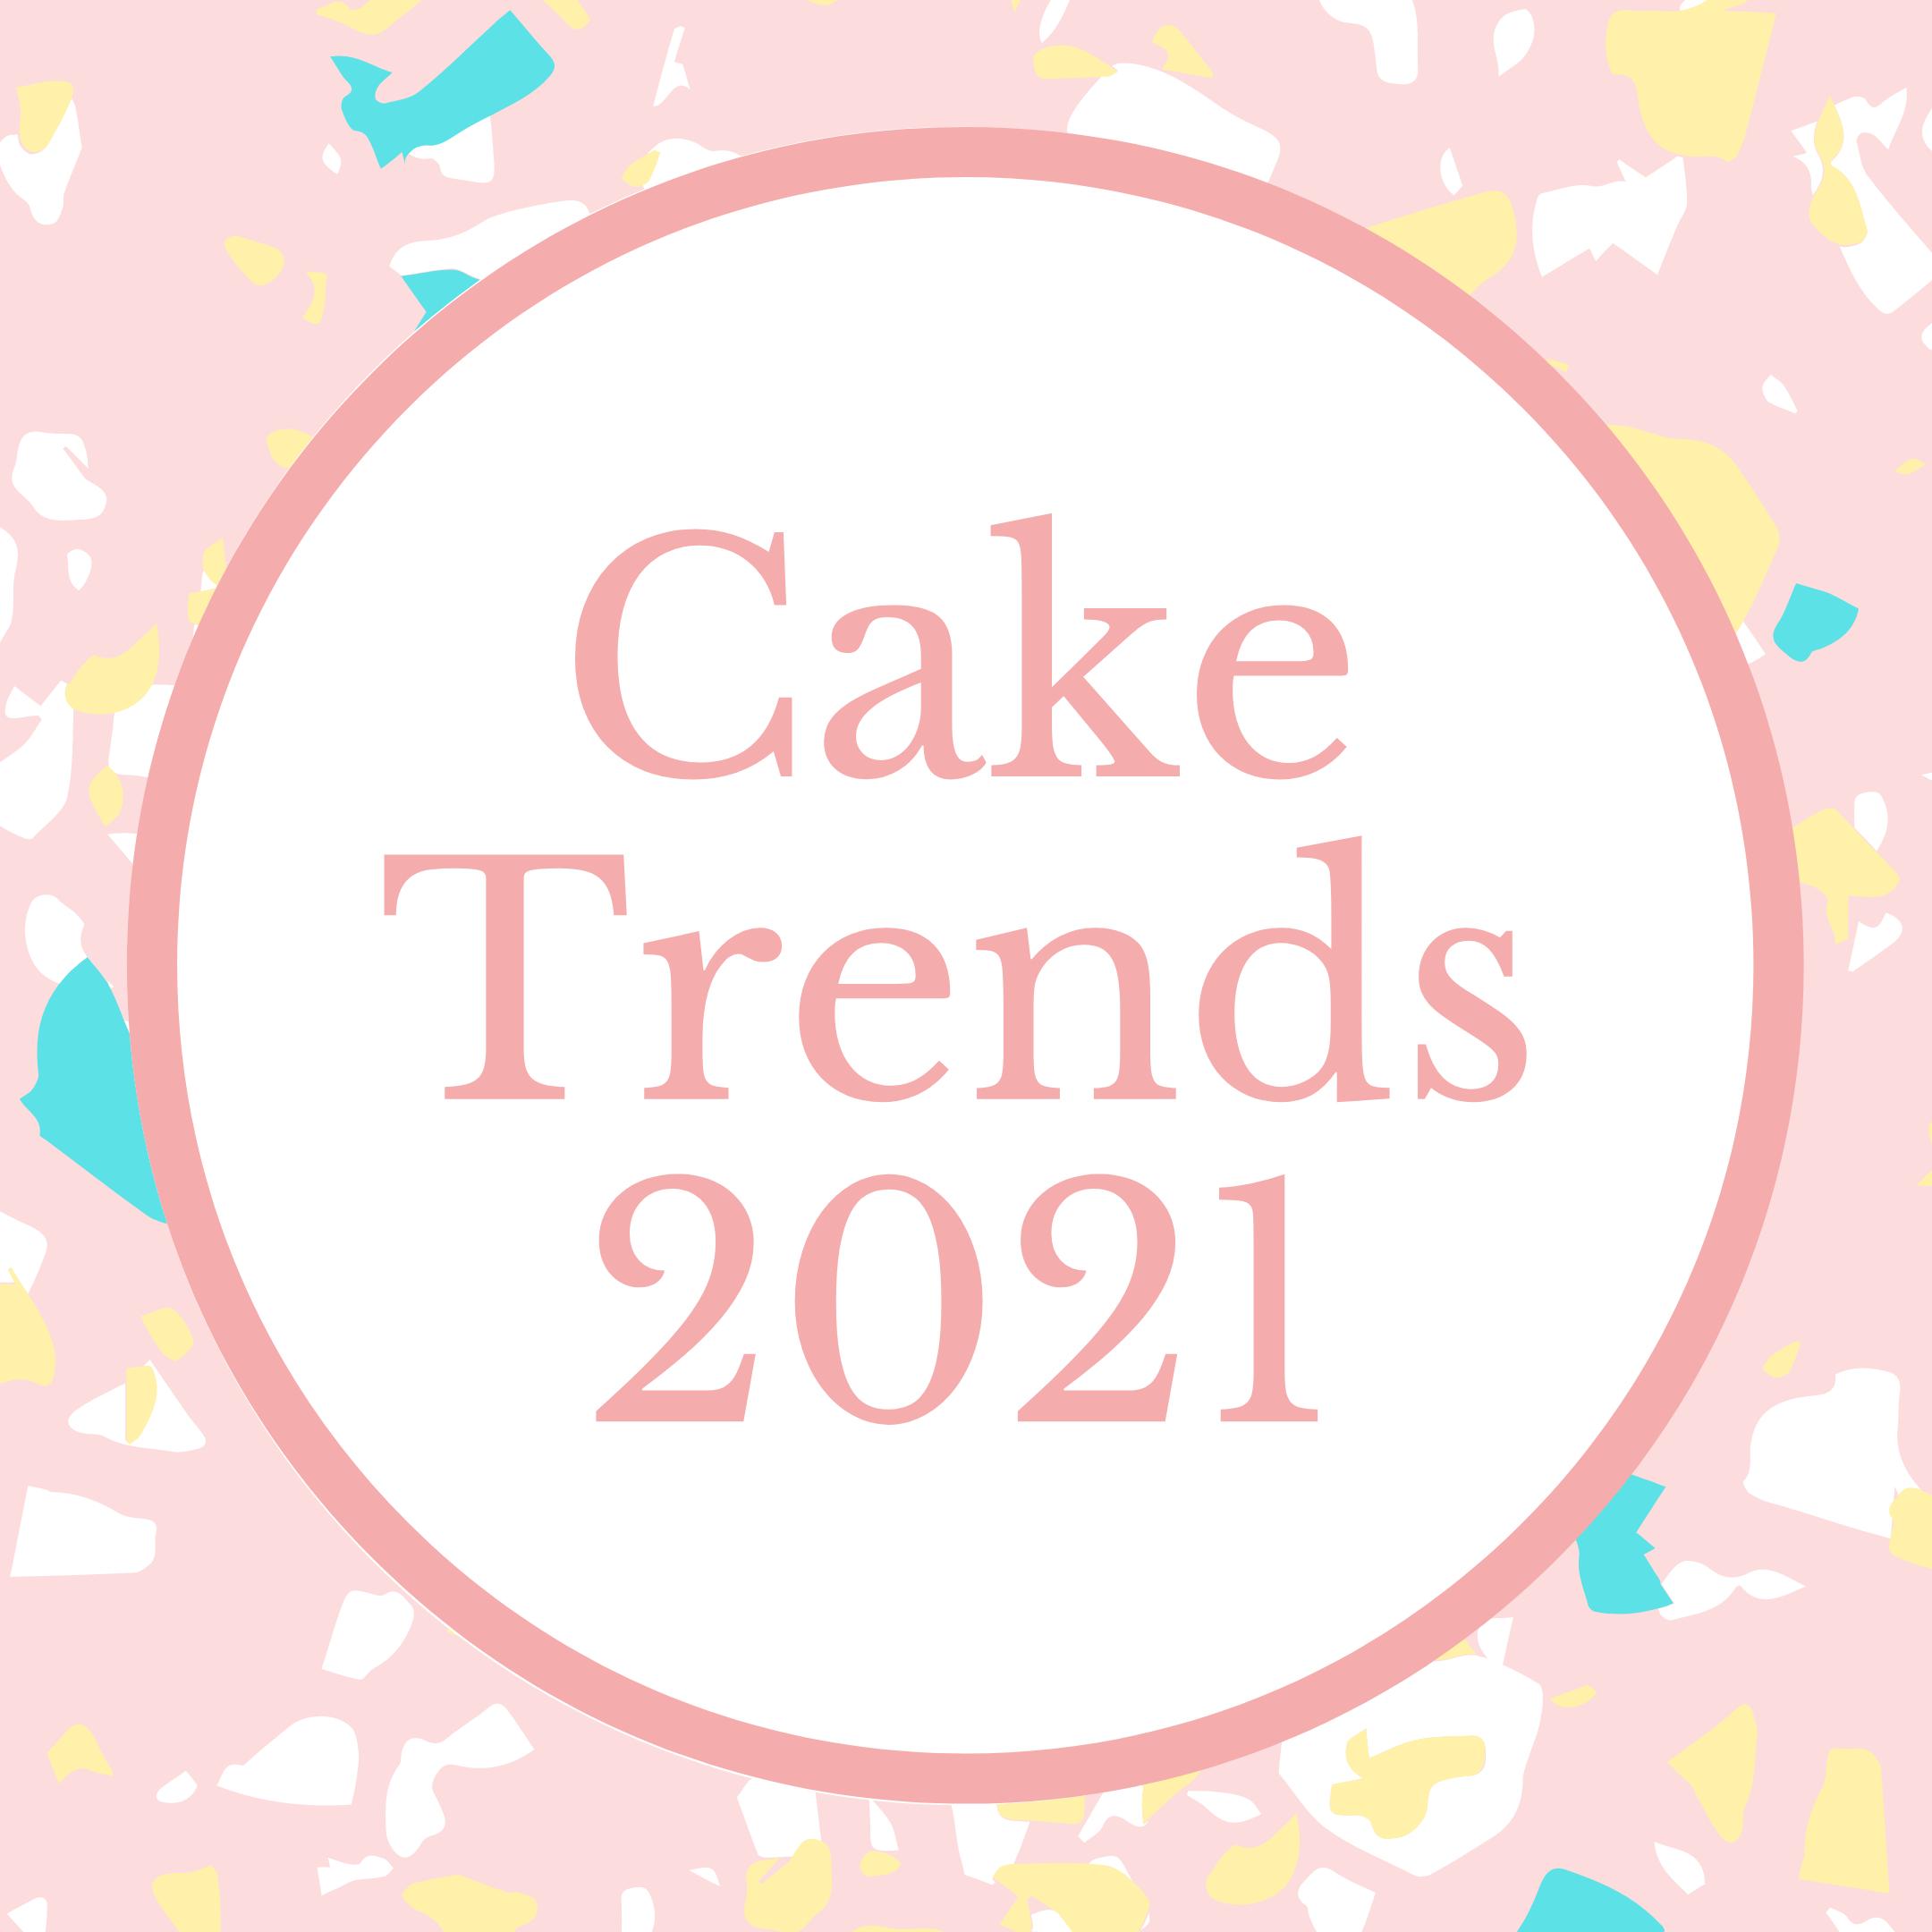 Cake Trends 2021